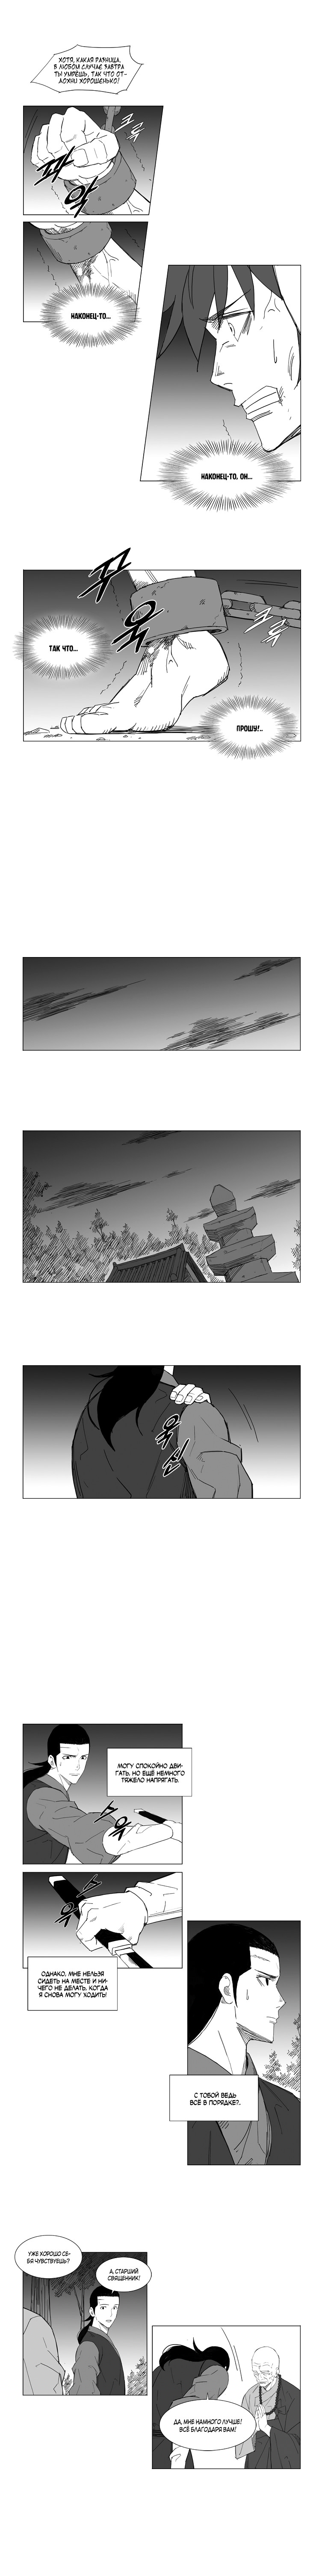 https://r1.ninemanga.com/comics/pic2/39/28263/318378/1486926315800.jpg Page 3